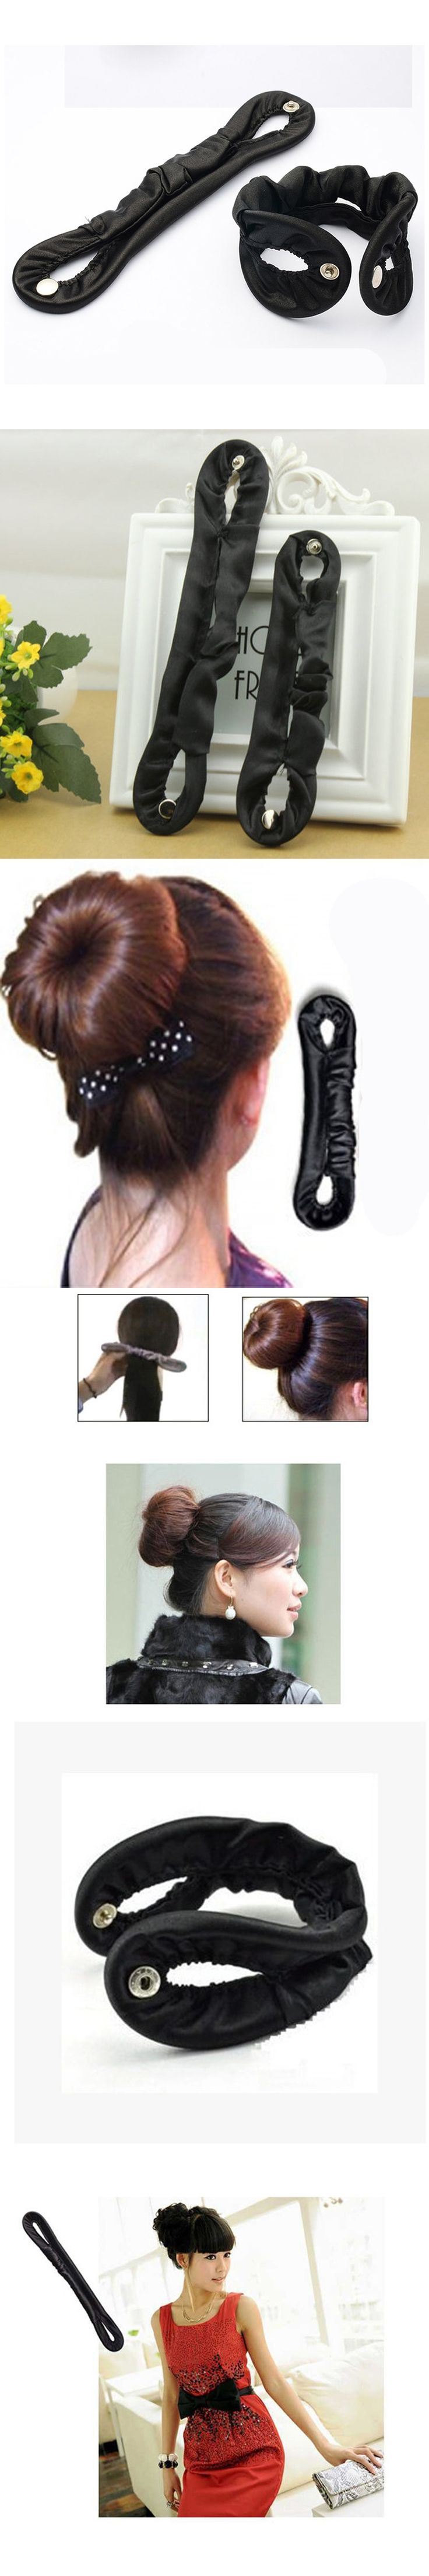 1pcs French Headdress Styling Magic Hair Sponge Foam Curler Maker Former Twist Tool Hair Accessories